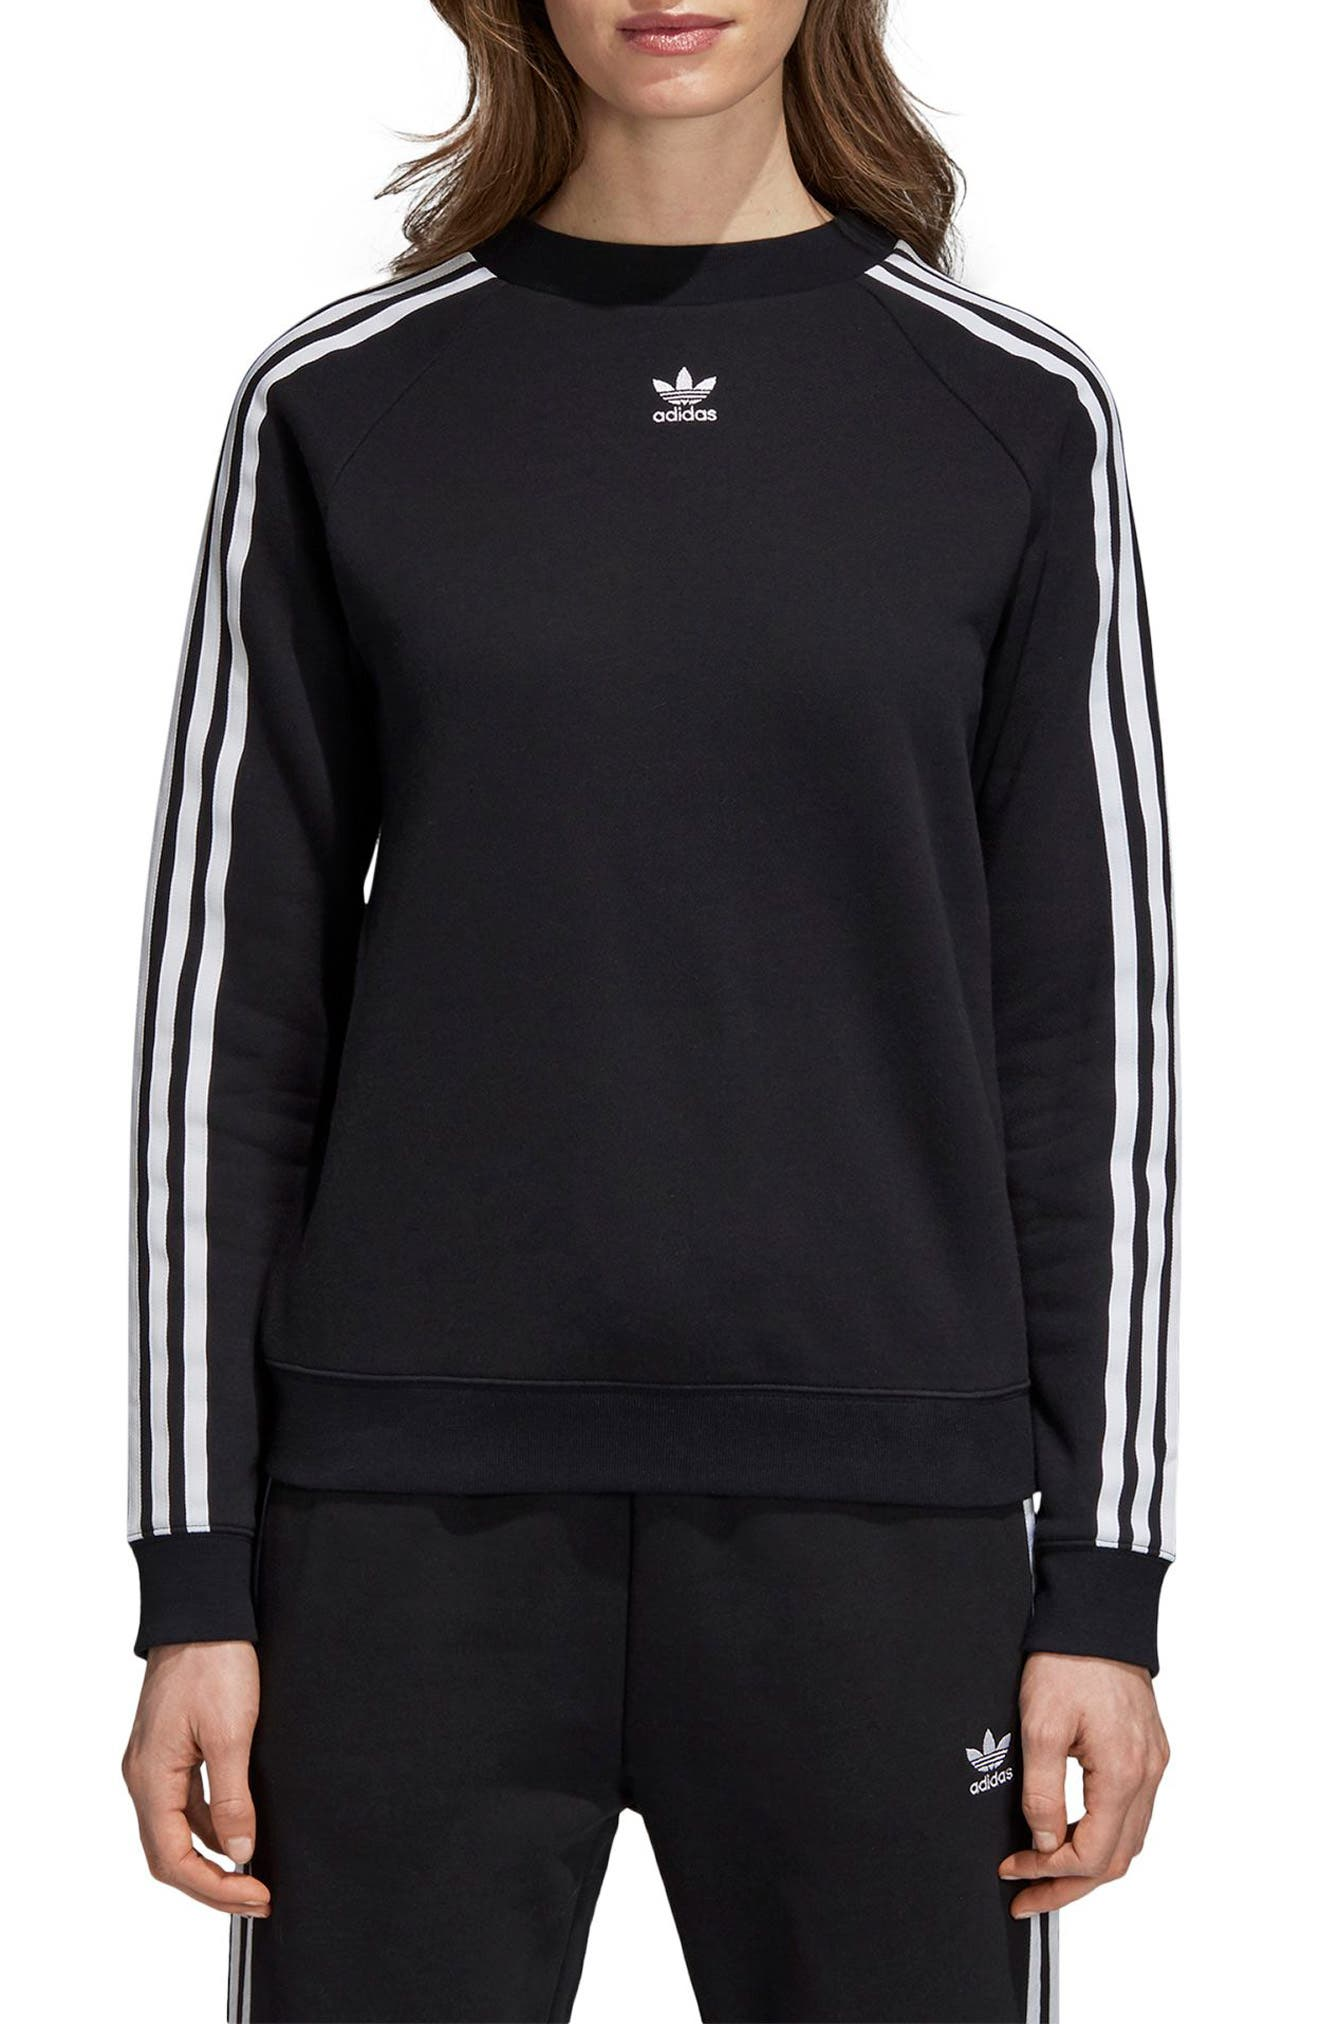 TRF Sweatshirt,                             Main thumbnail 1, color,                             BLACK